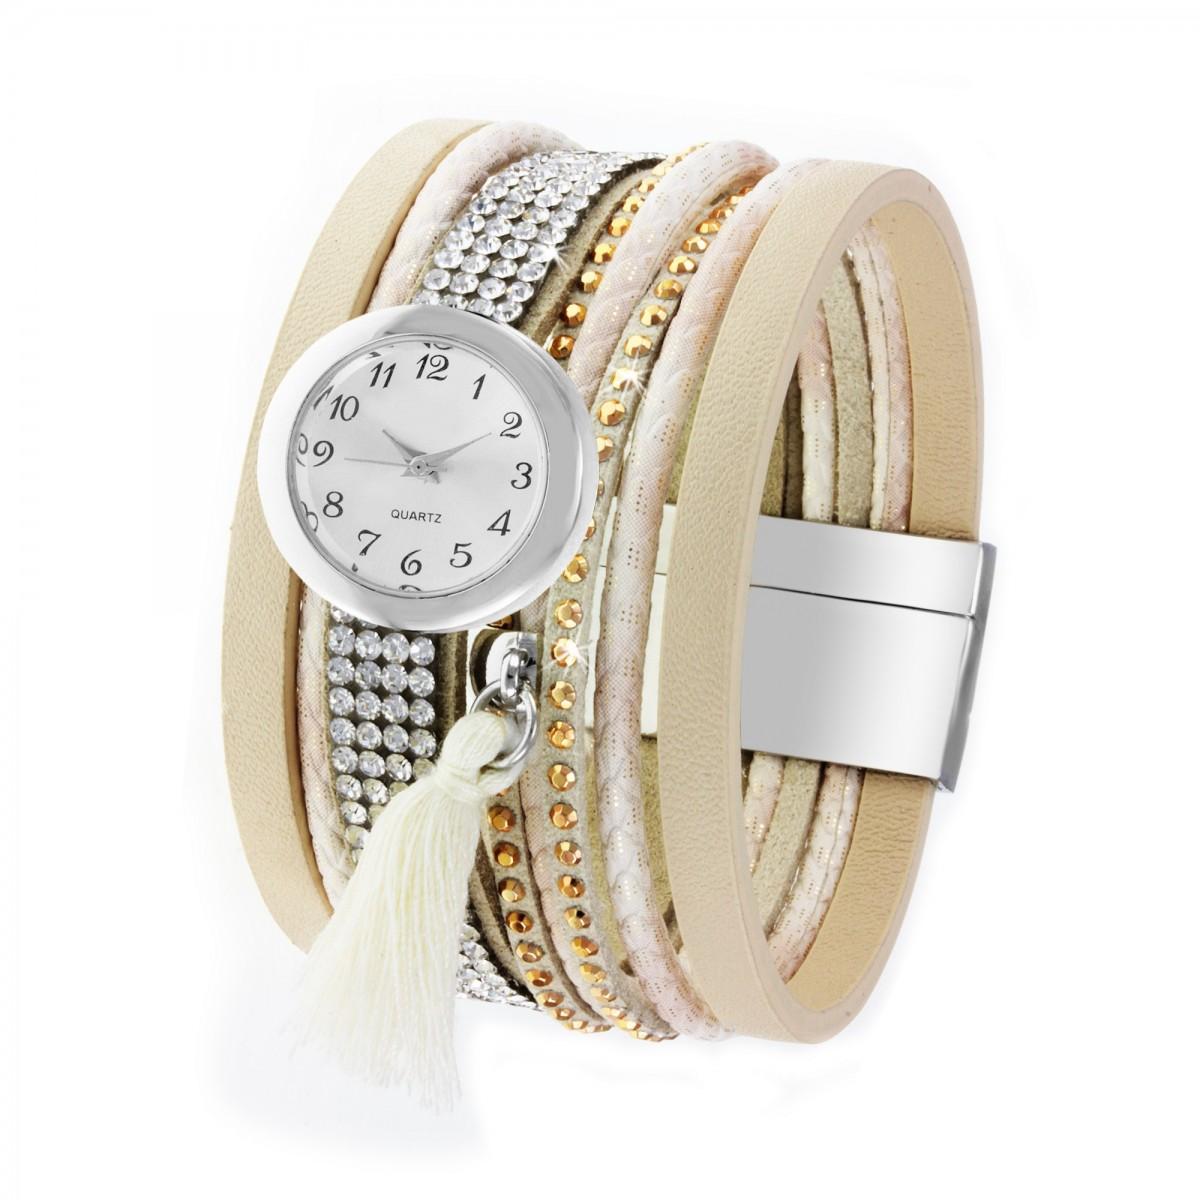 Montre bracelet So Charm